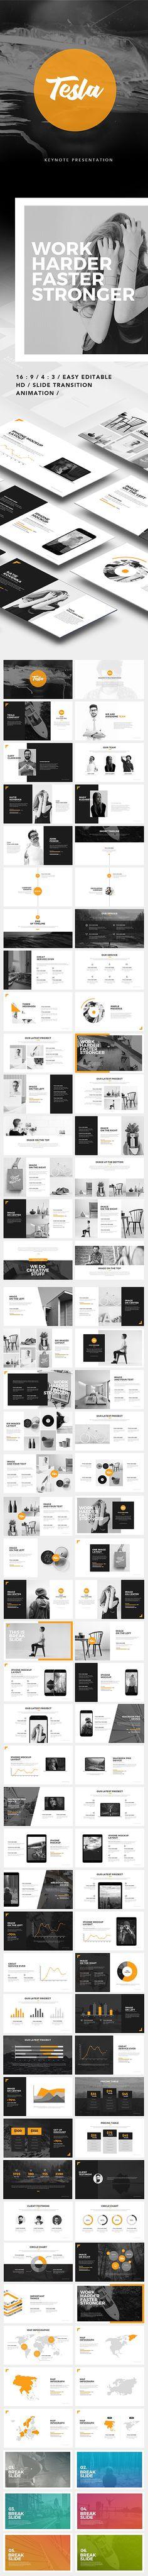 excelsior presentation template | business, business powerpoint, Presentation templates